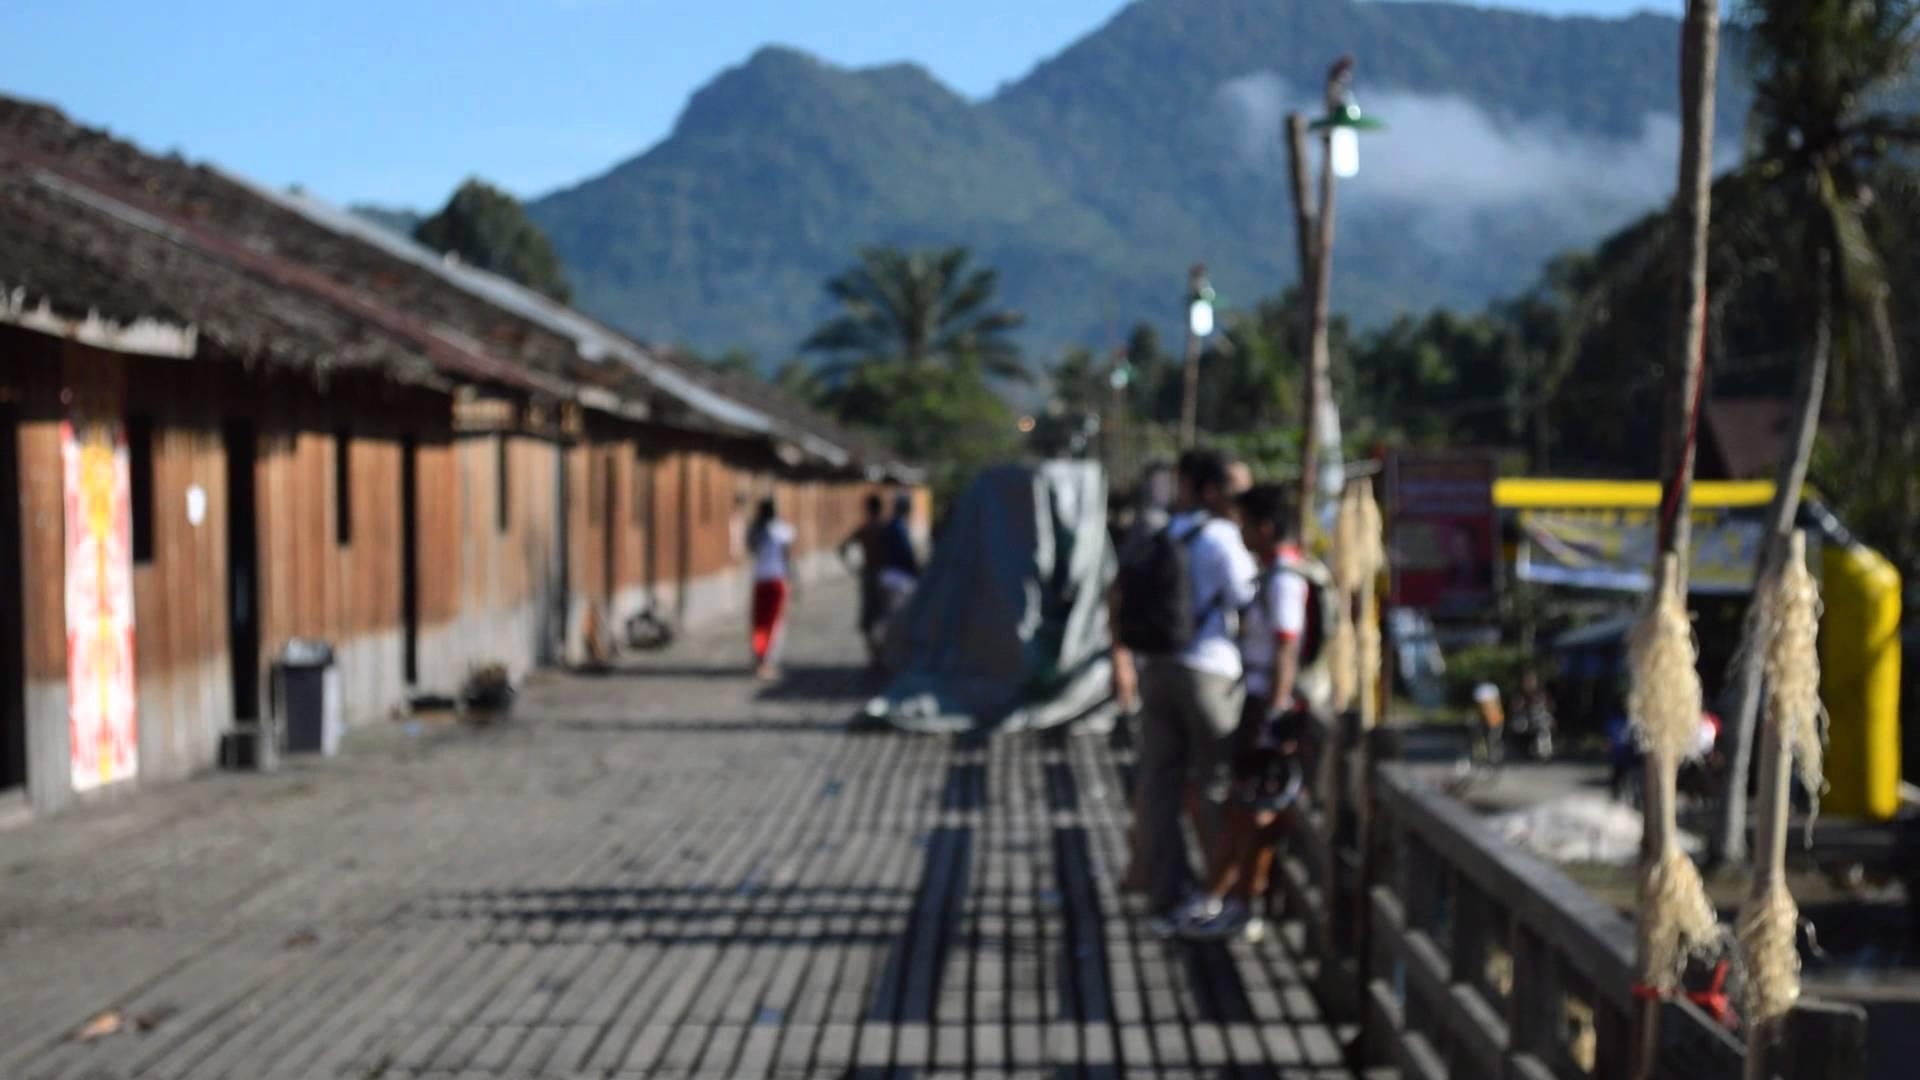 Rumah Betang Suku Dayak Kec Sengah Temila Youtube Radakng Kab